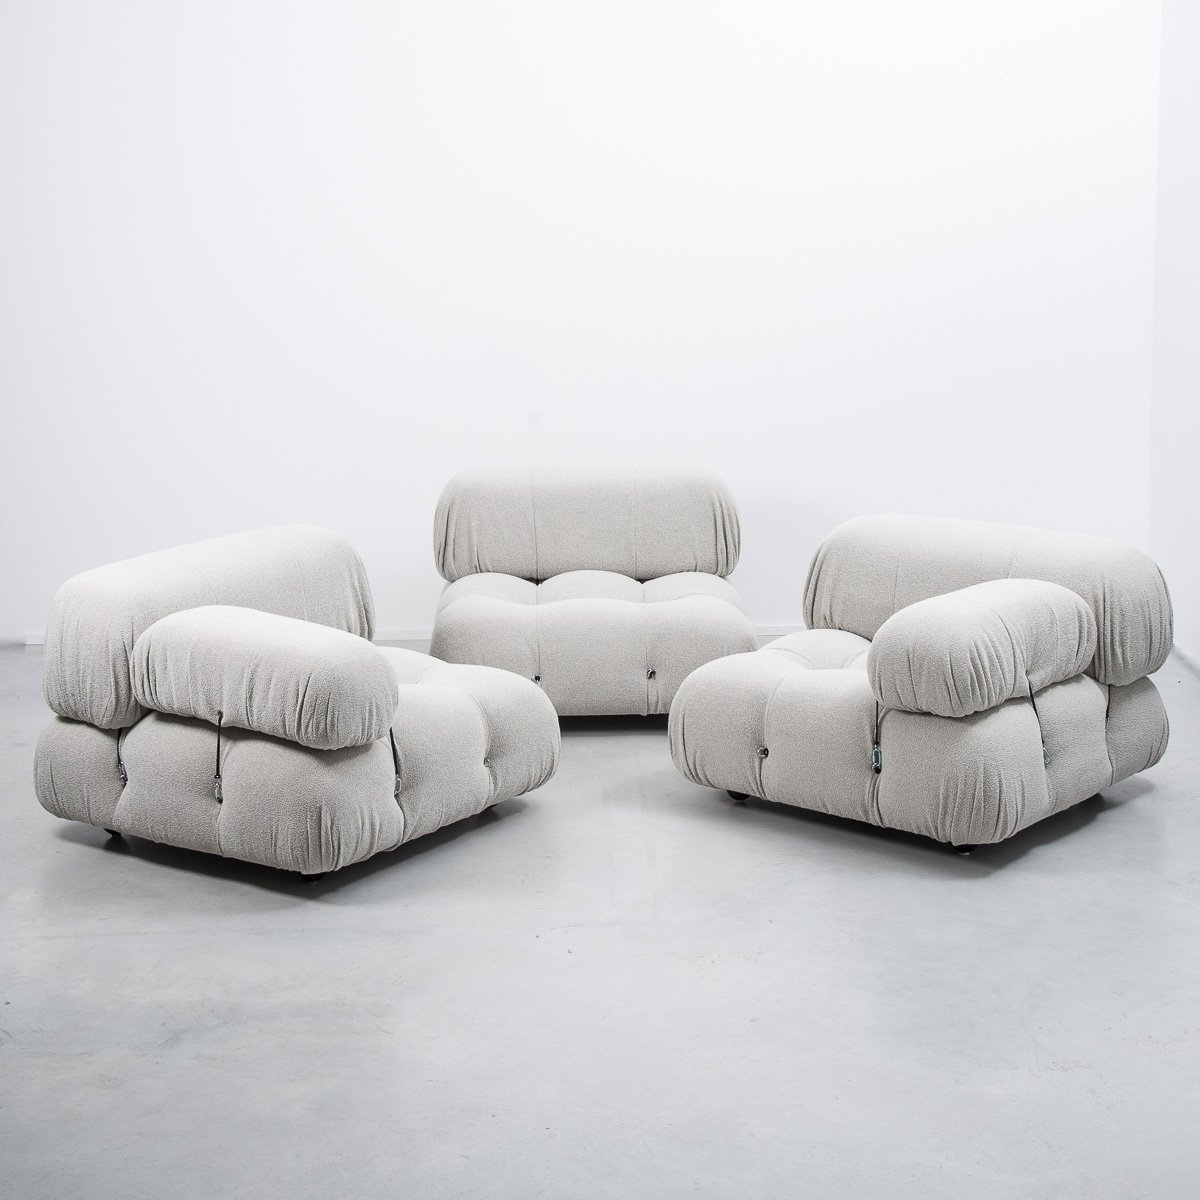 Camaleonda Three Seater Modular Sofa By Mario Bellini For B B Italia 1970s For Sale At Pamono